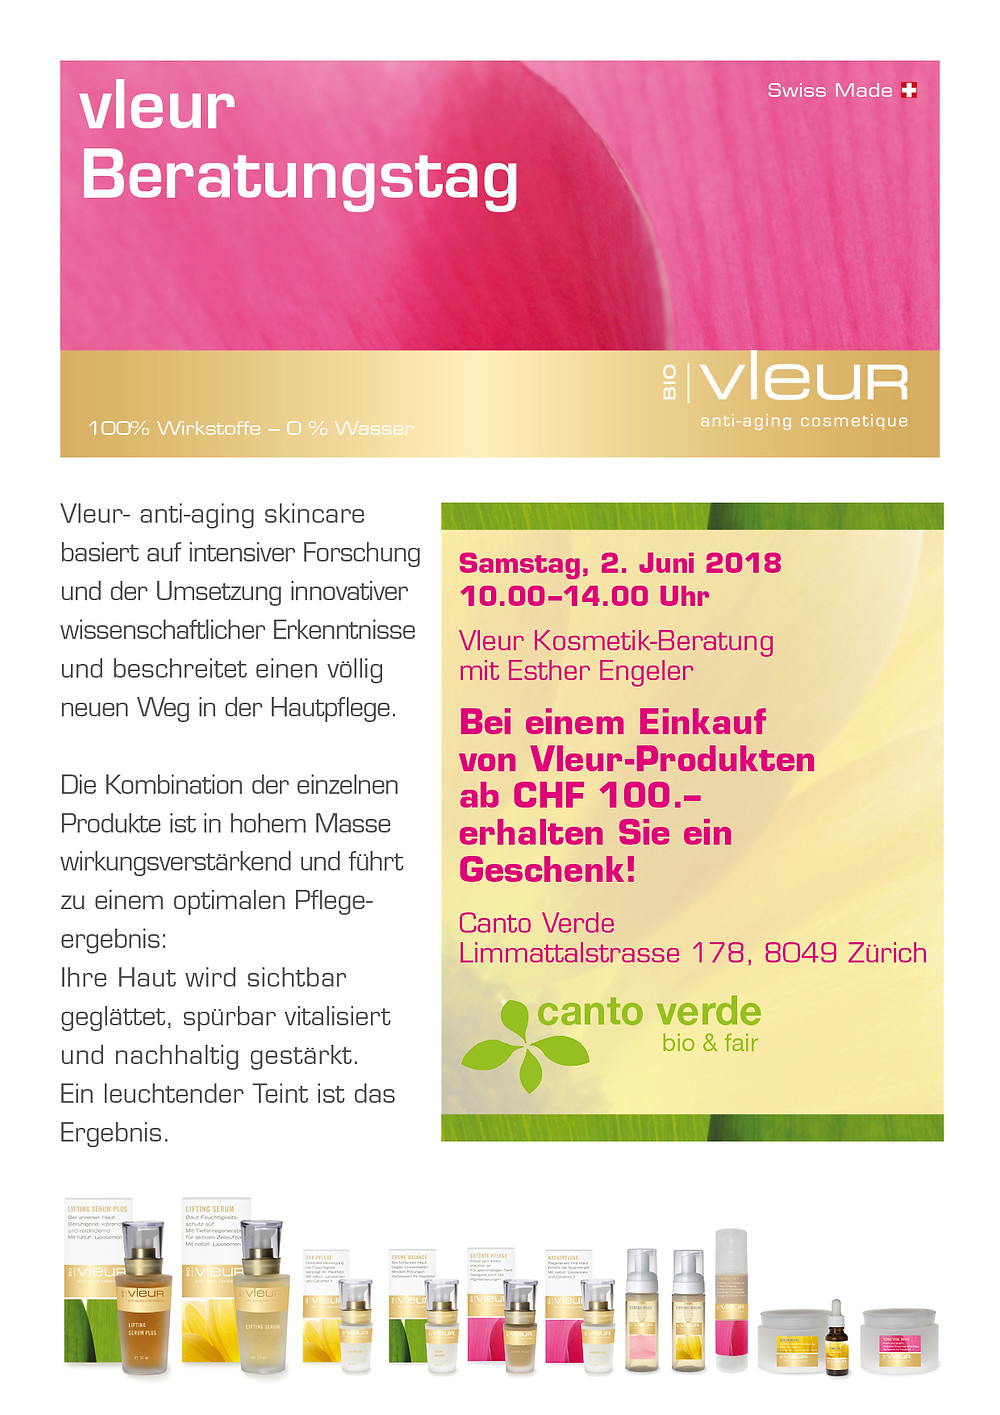 Flyer_Beratungstage_canto verde_2.6.2018